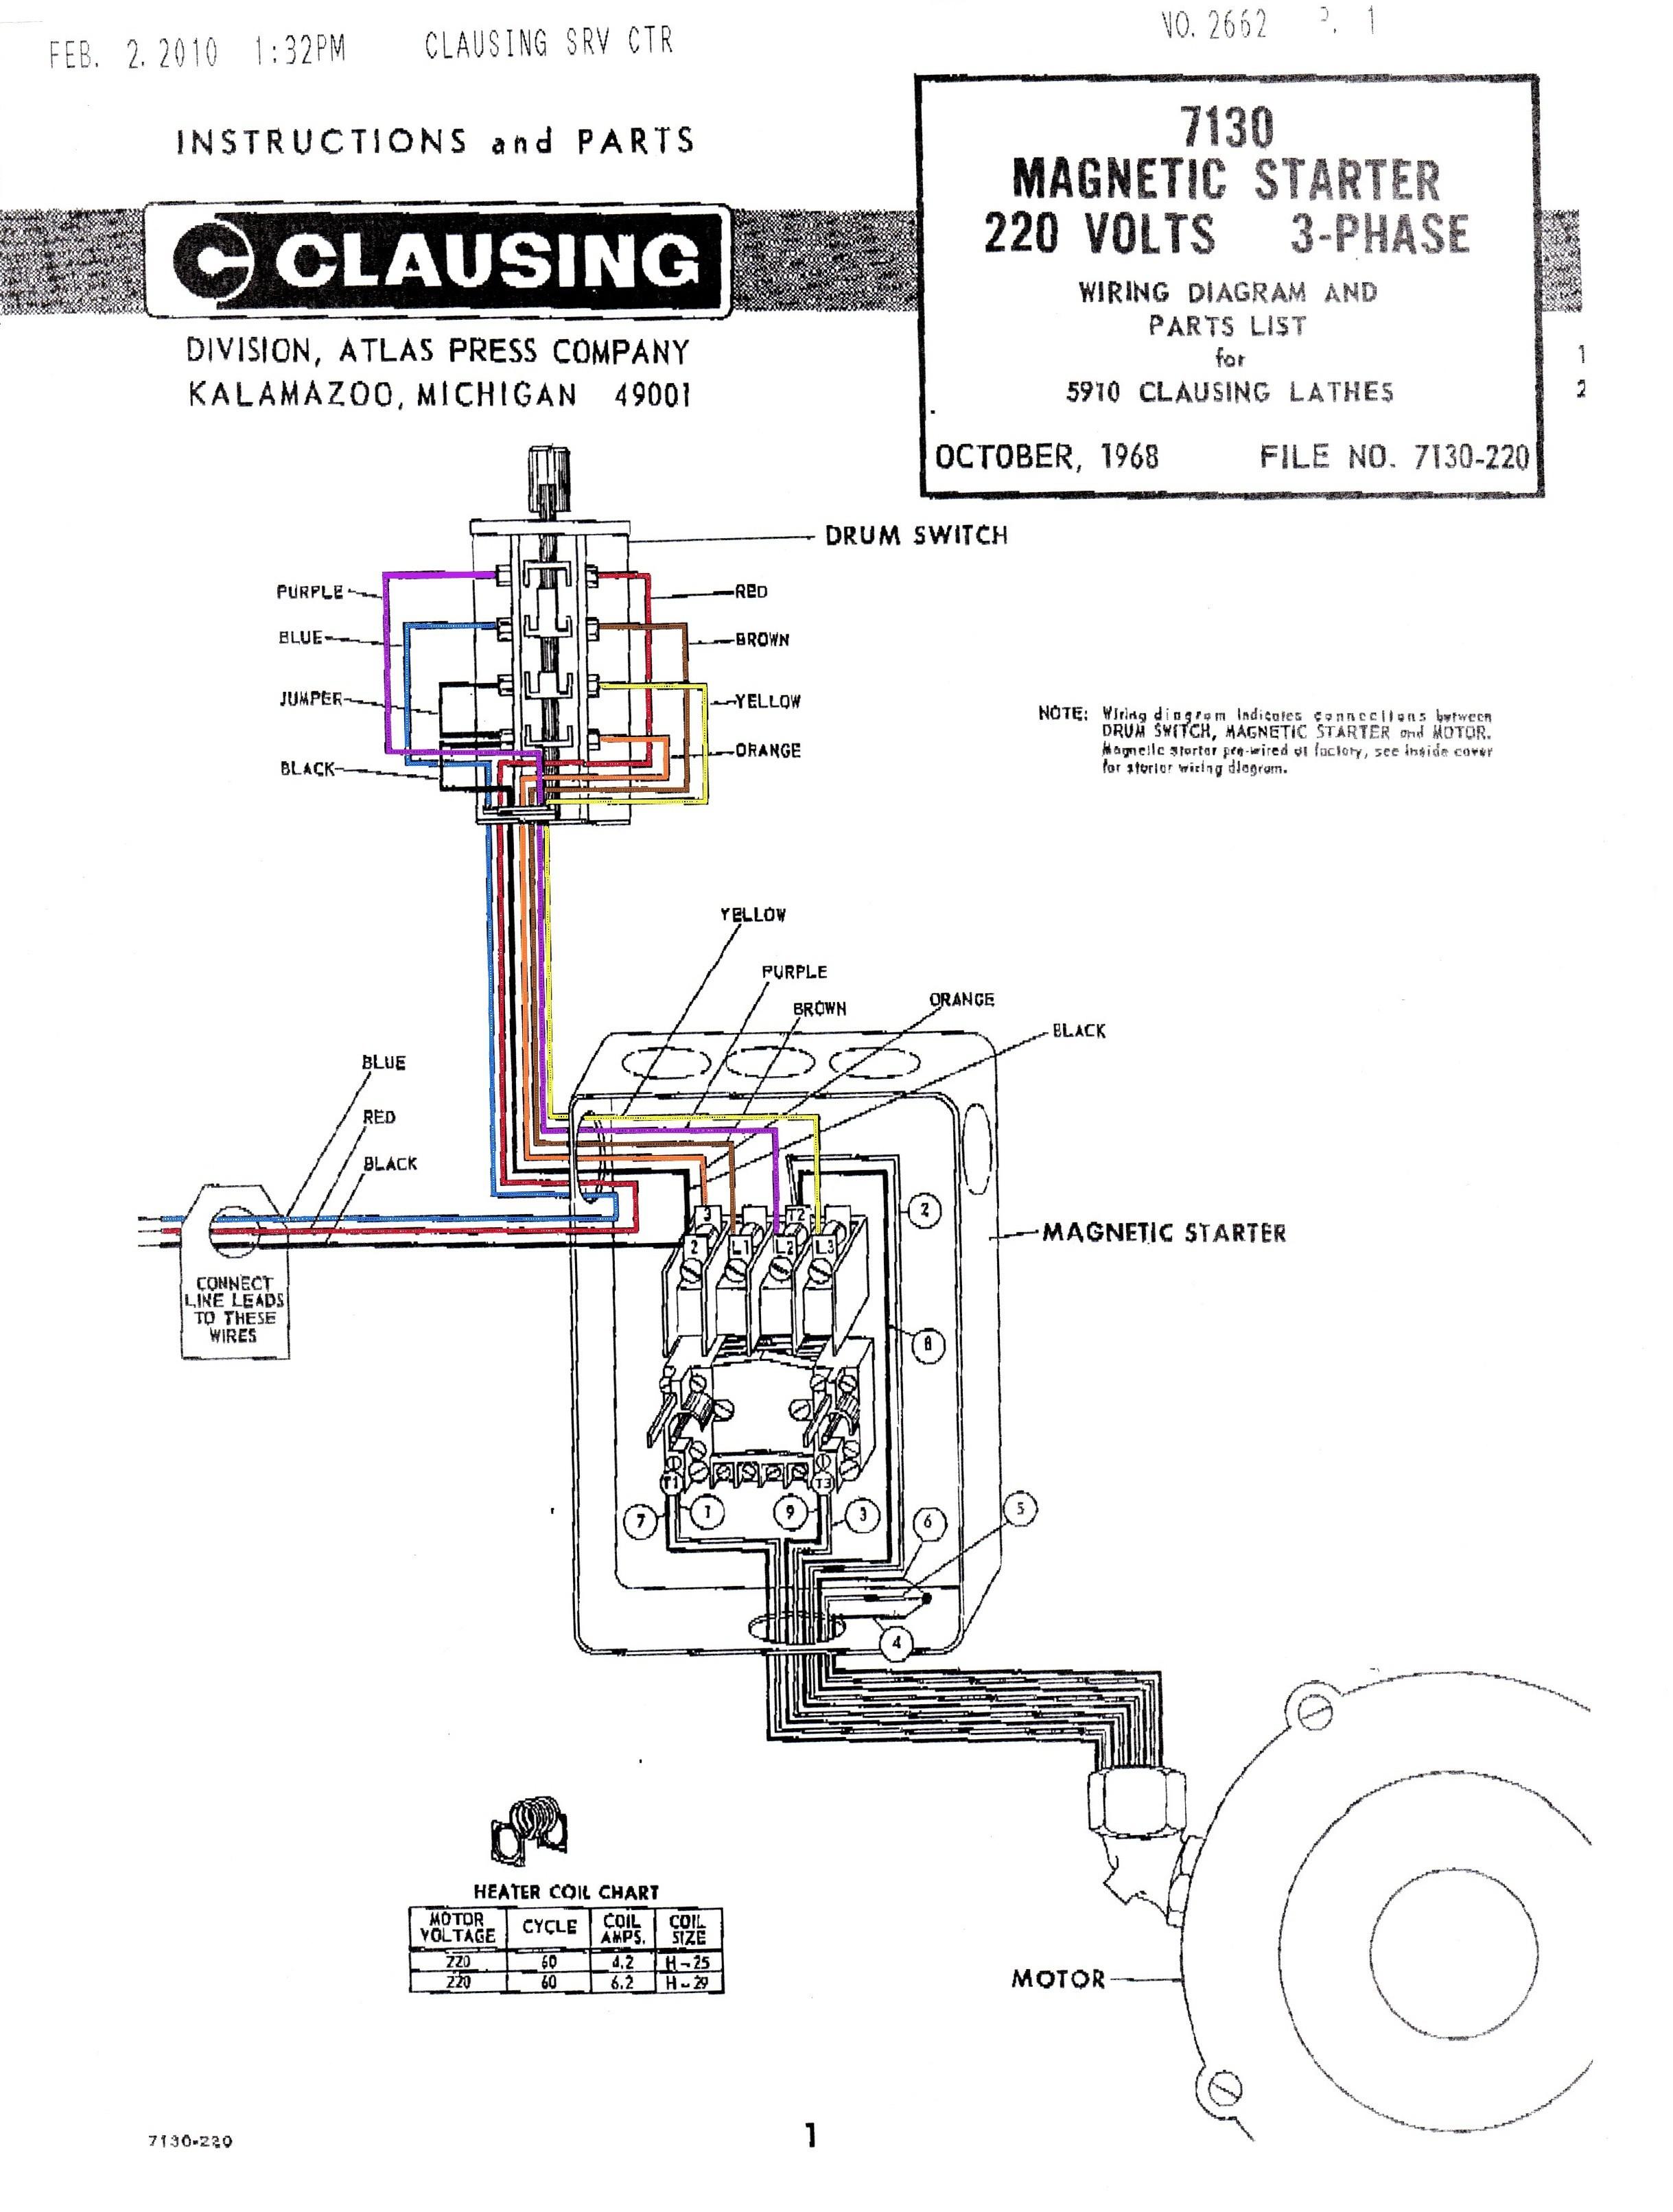 Single Phase Motor Starter Wiring Diagram 240v Single Phase Motor